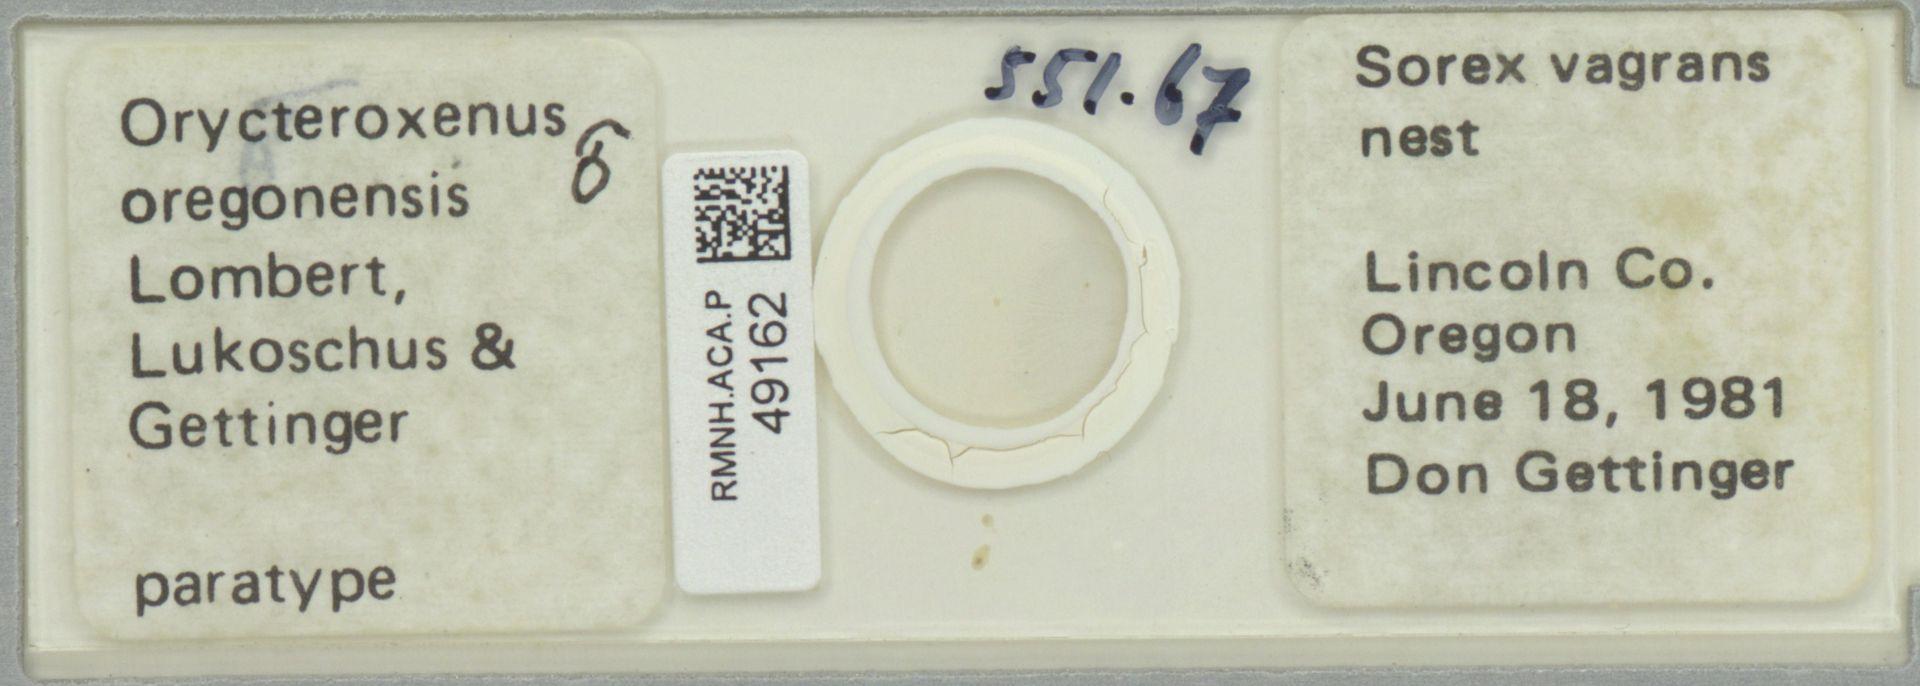 RMNH.ACA.P.49162   Orycteroxenus oregonensis Lombert, Lukoschus & Gettinger